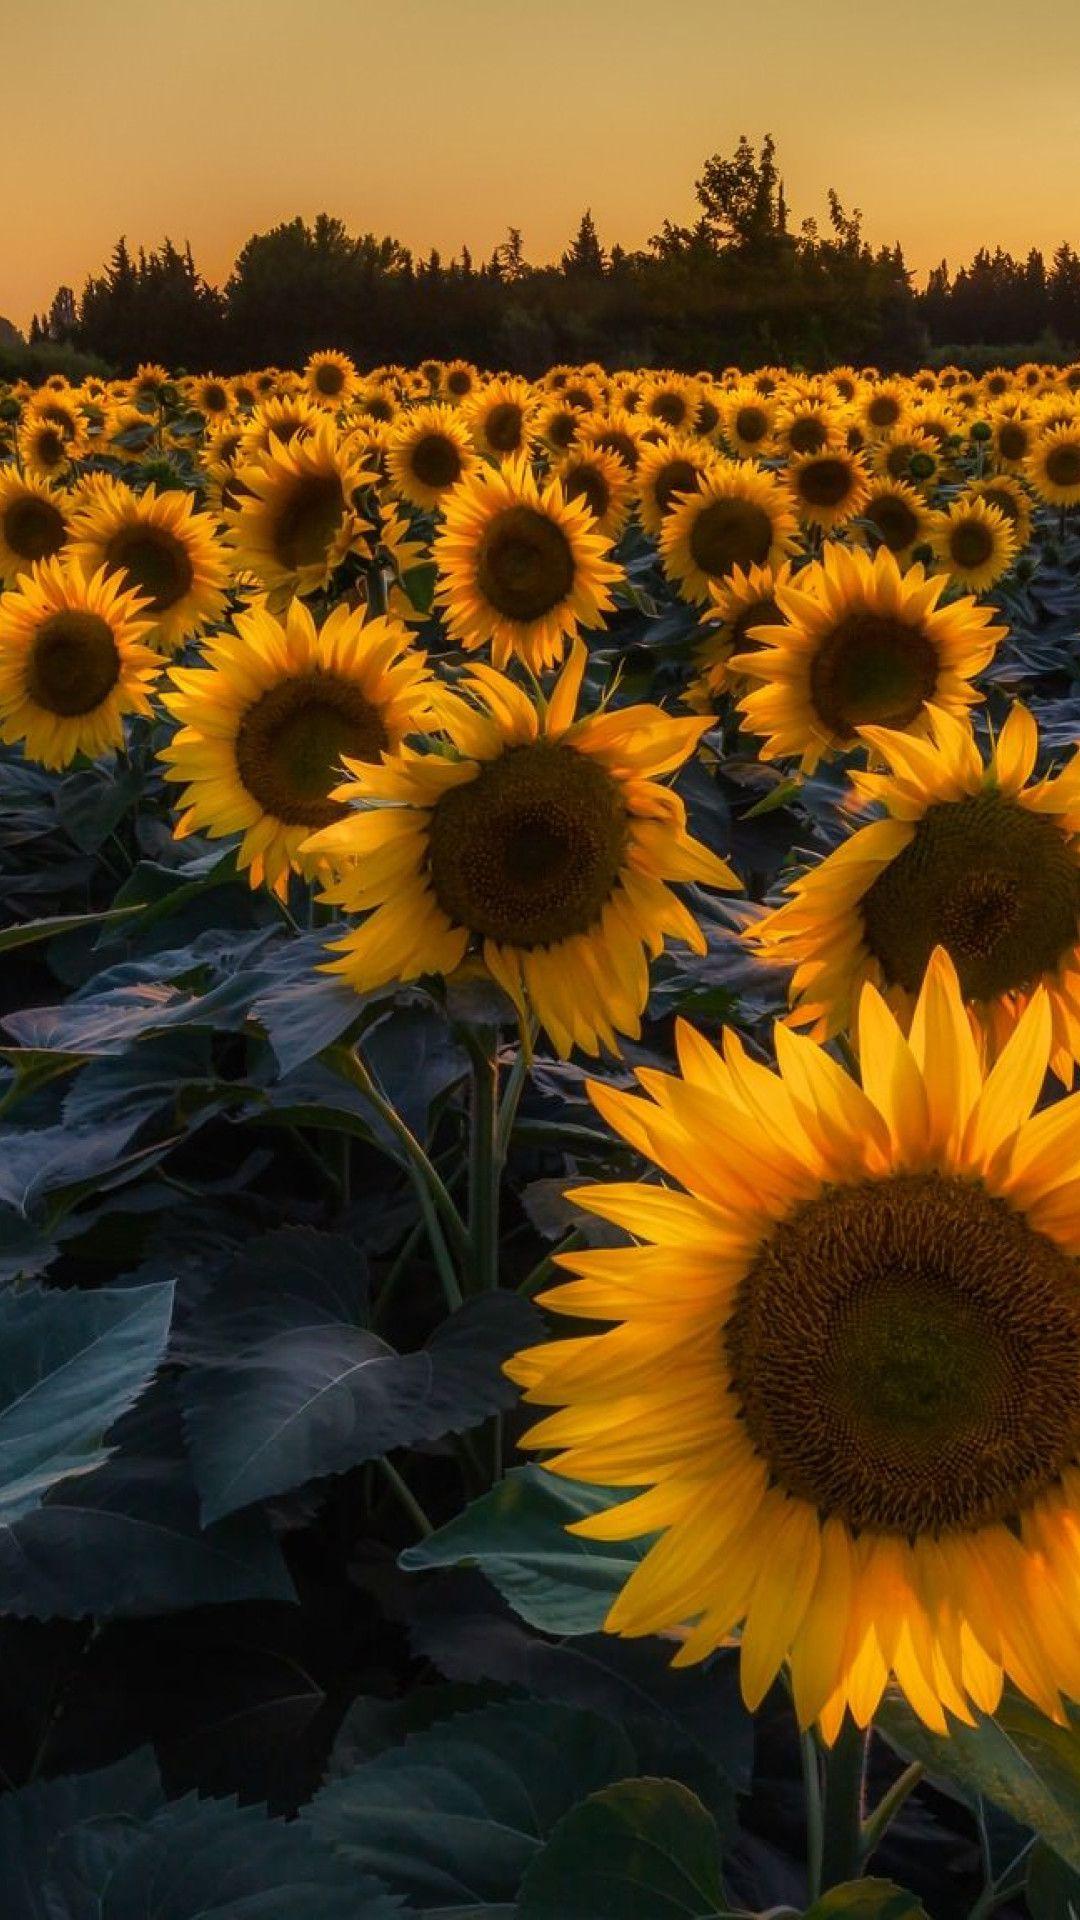 Vintage Sunflower 4k High Resolution Wallpapers ...